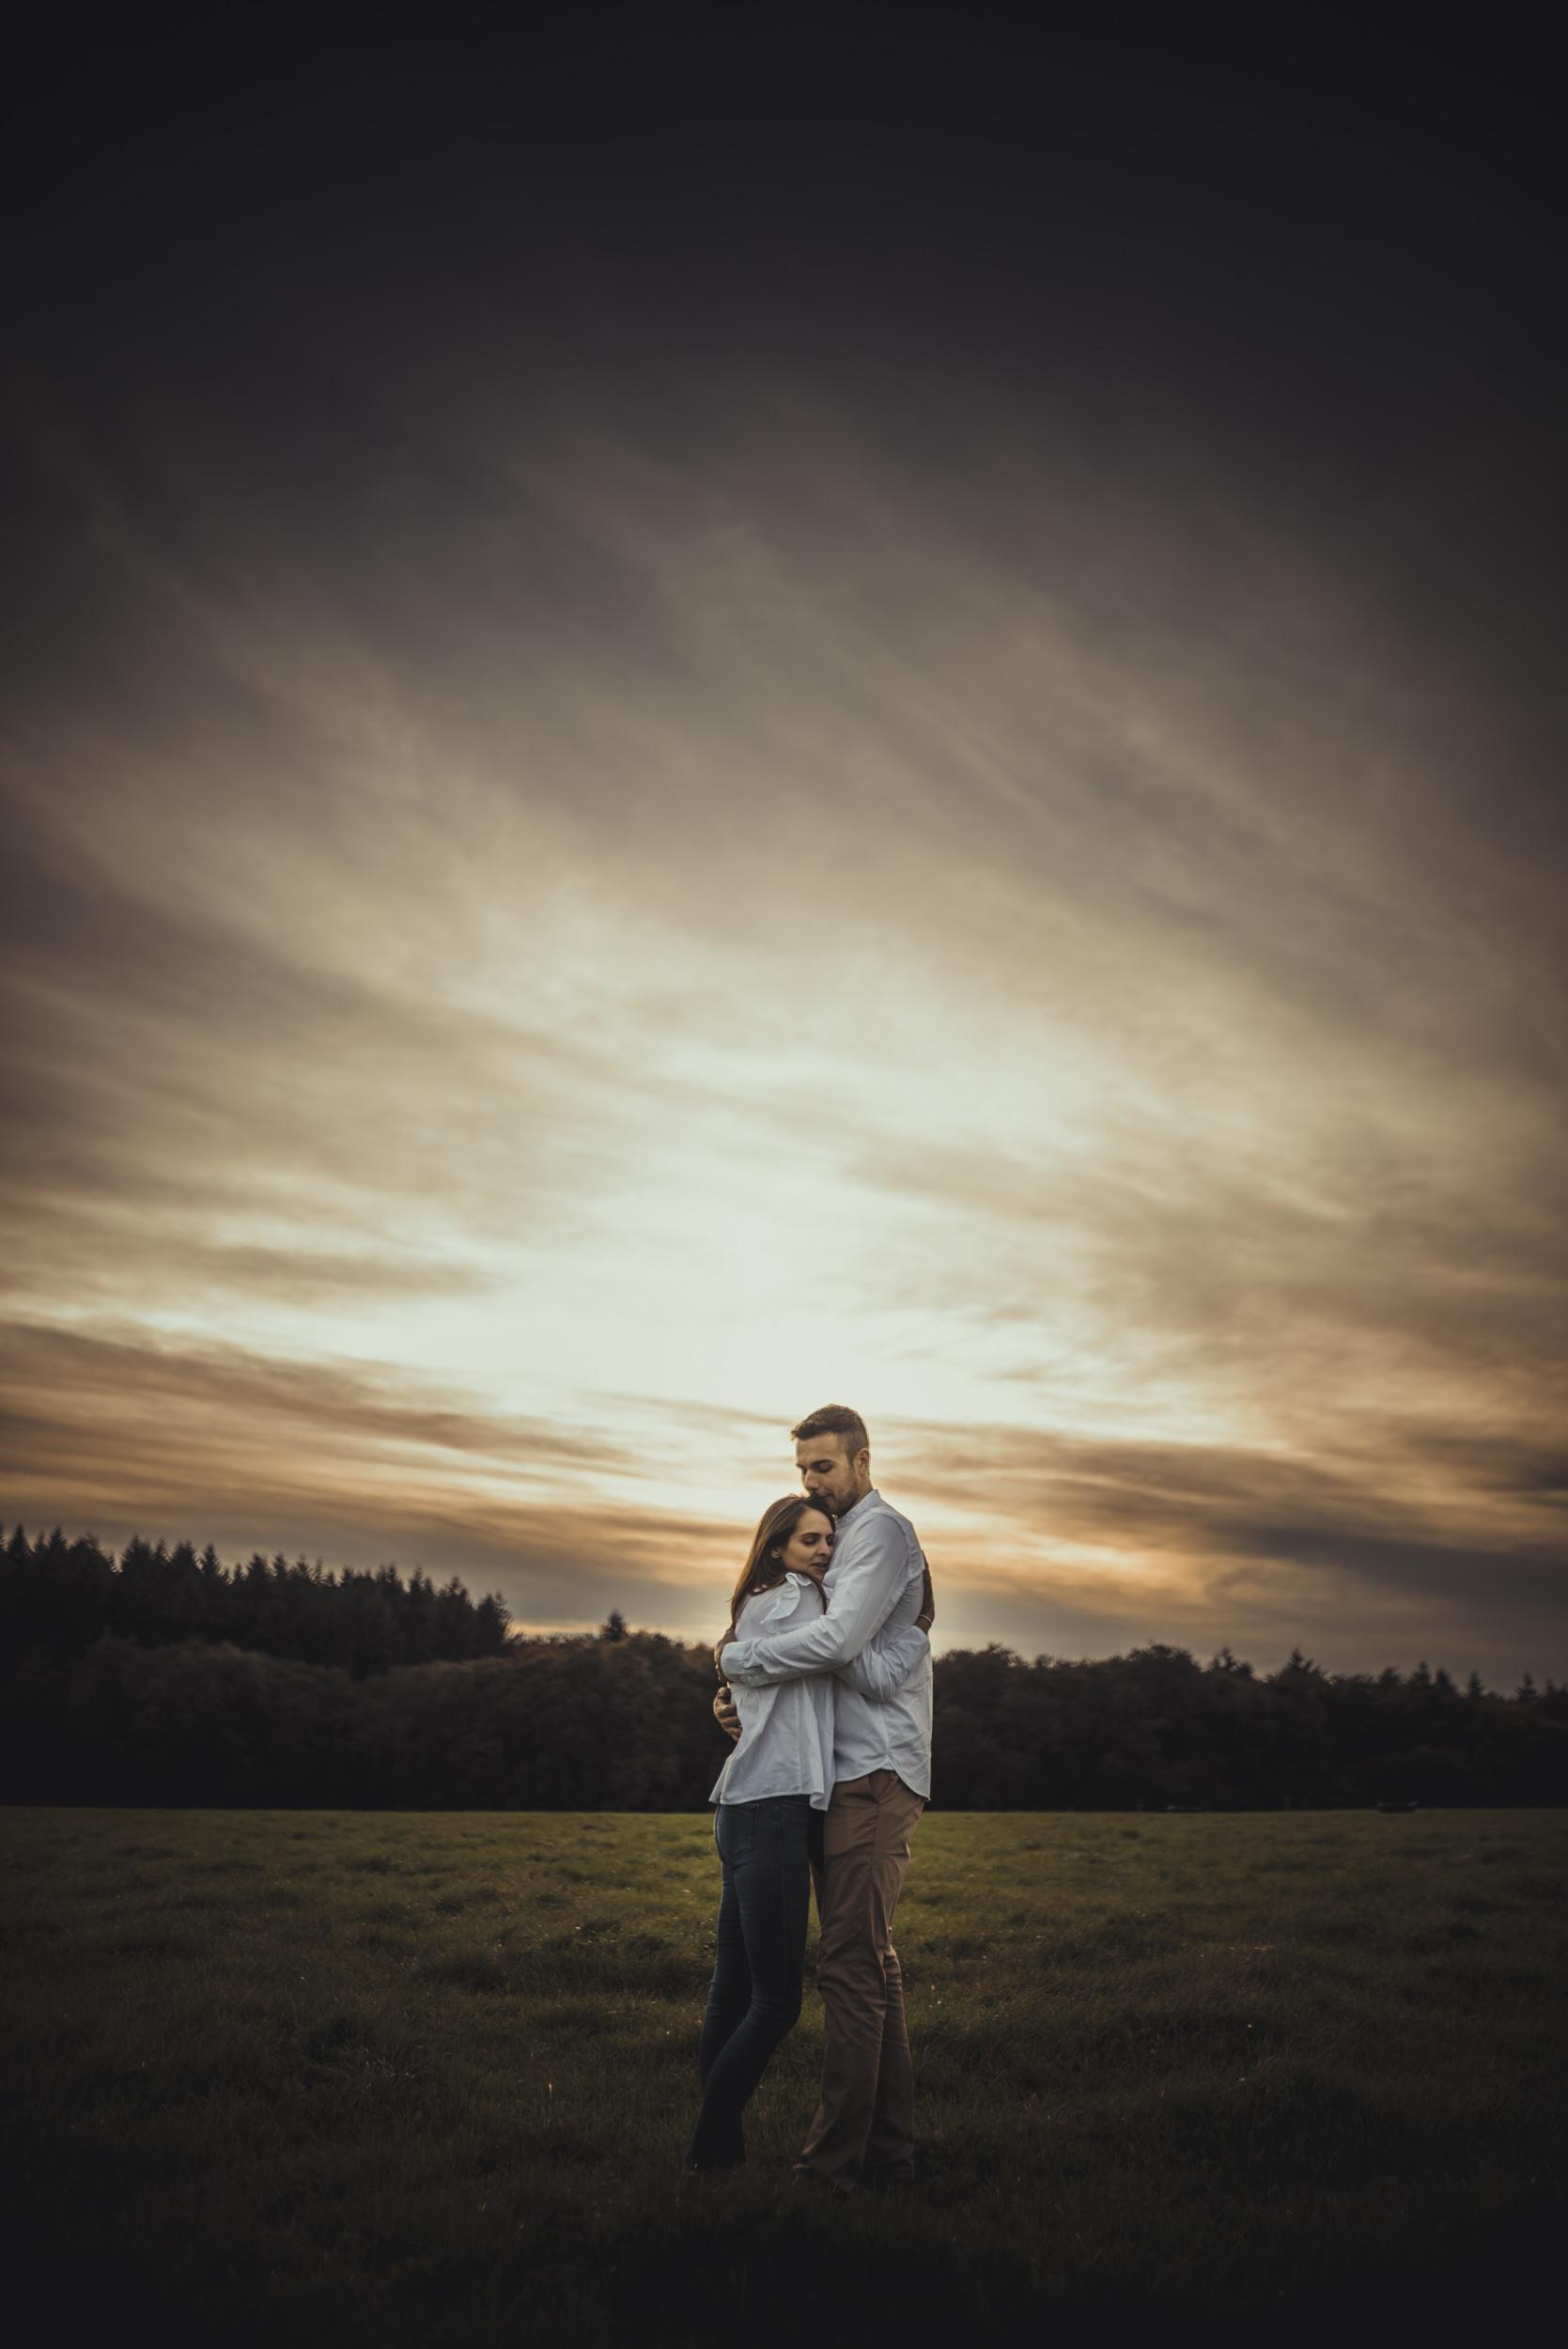 Emma-and-Jon-engagement-session-Fair-Oak-Manu-Mendoza-Wedding-Photography-066.jpg